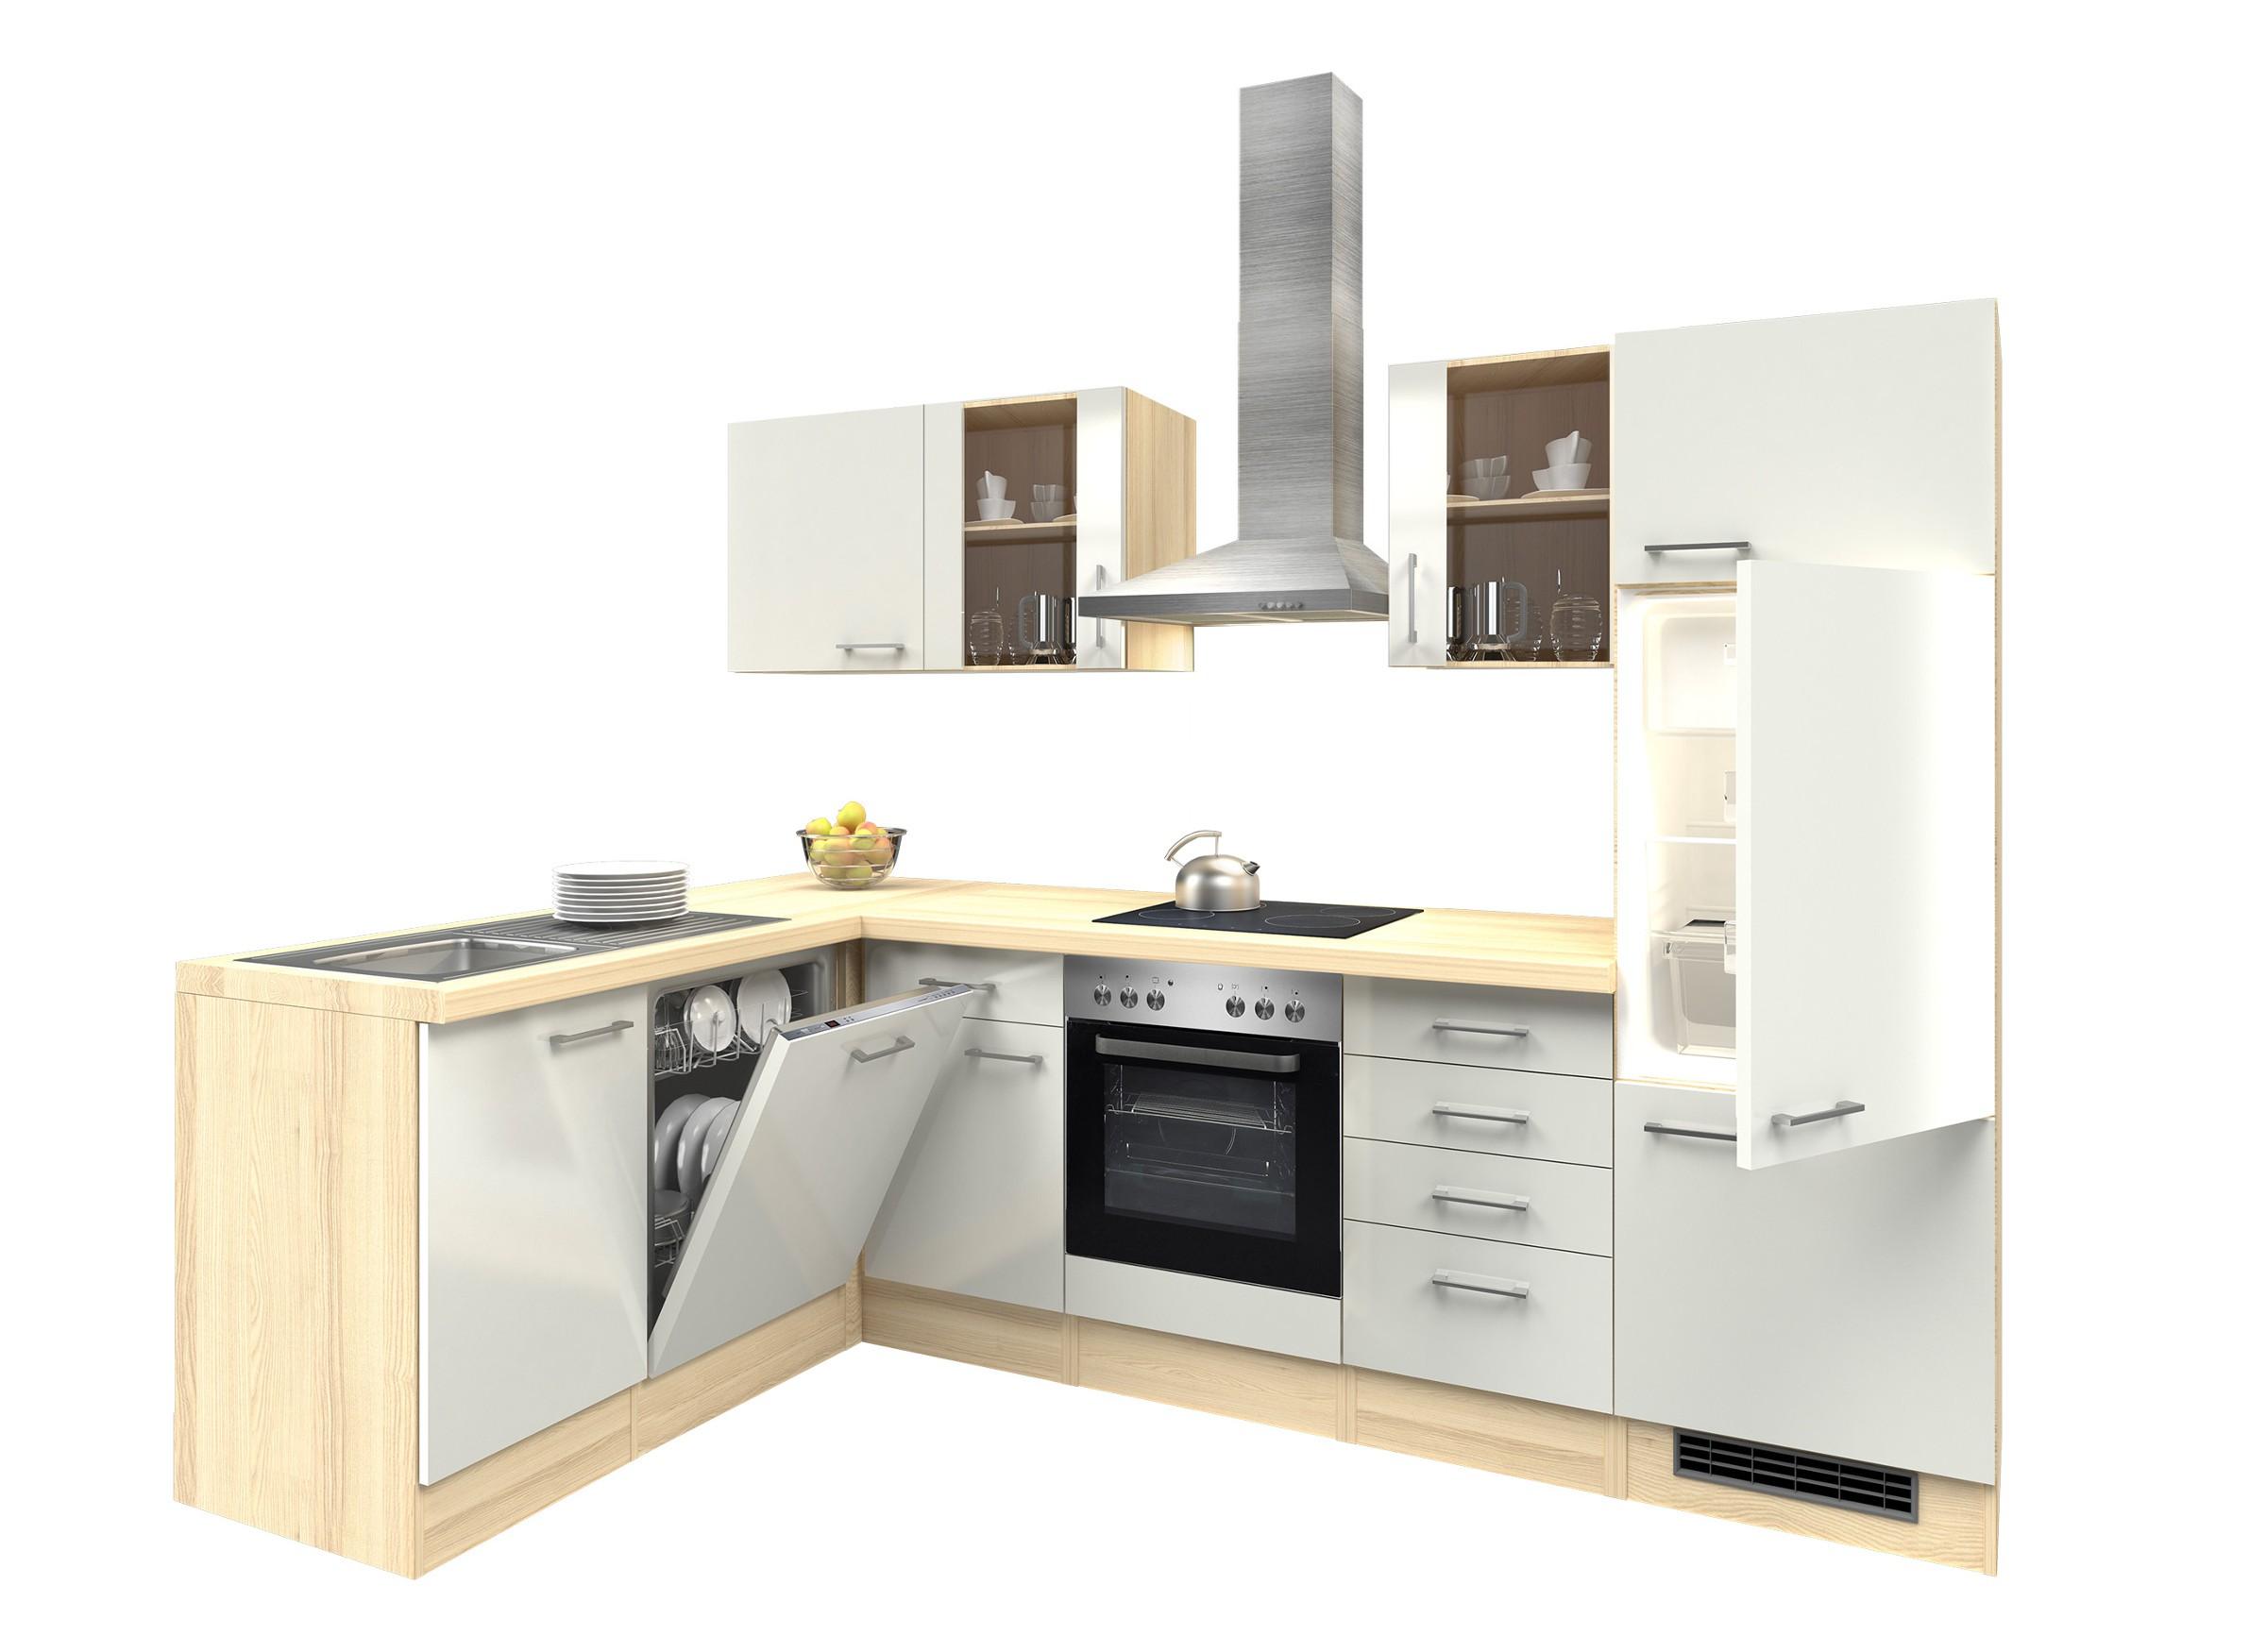 Eckküche Mit Elektrogeräten Kreatives Haus Design